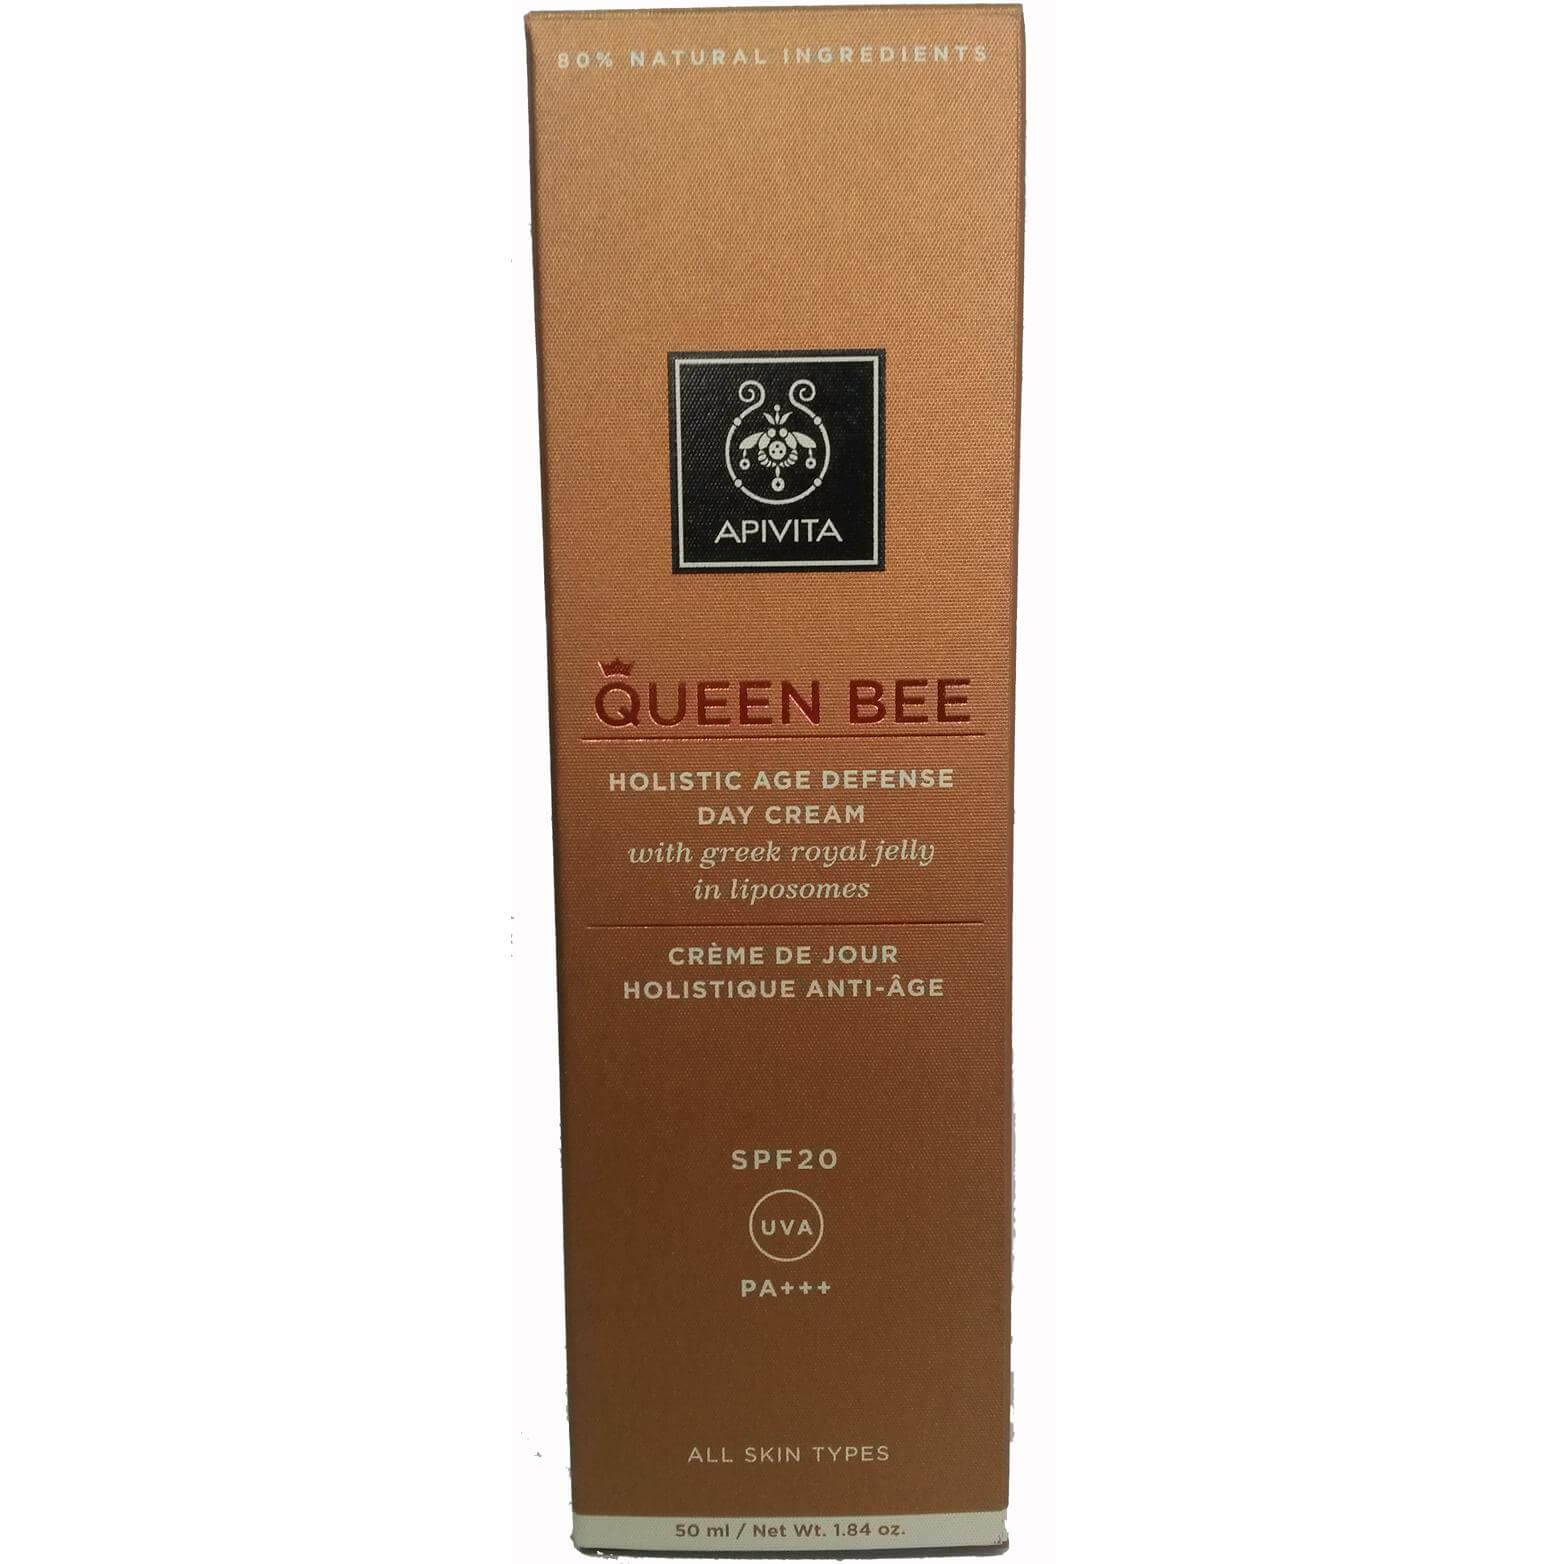 Apivita Queen Bee Kρέμα Ημέρας Ολιστικής Αντιγήρανσης Spf20 με Ελληνικό Βασιλικό Πολτό 50ml